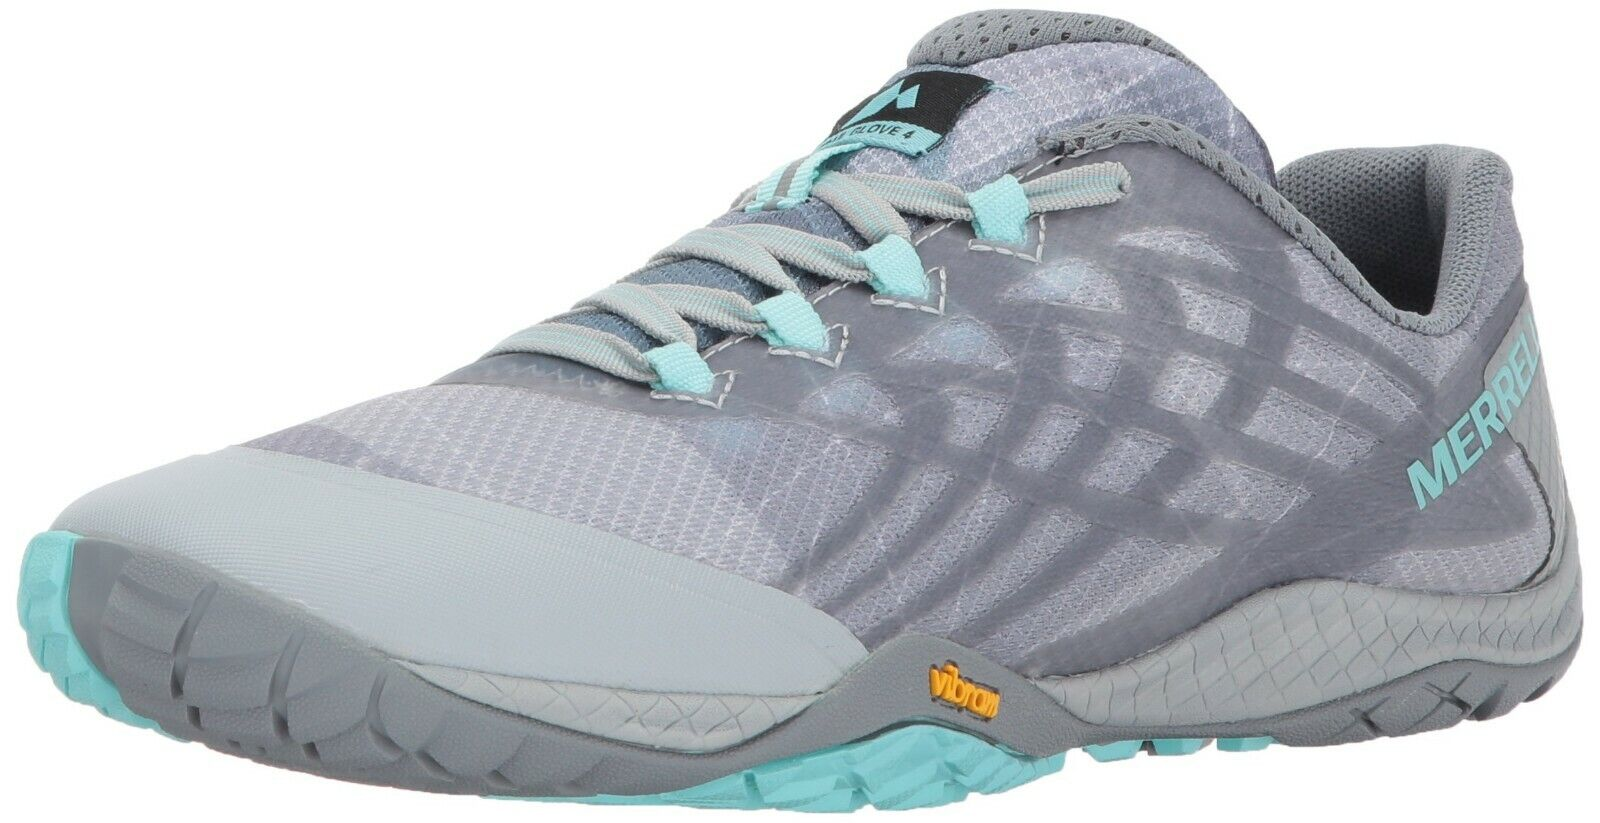 MERRELL J09662 Womens Trail Glove 4 High Rise Gray Shoes US